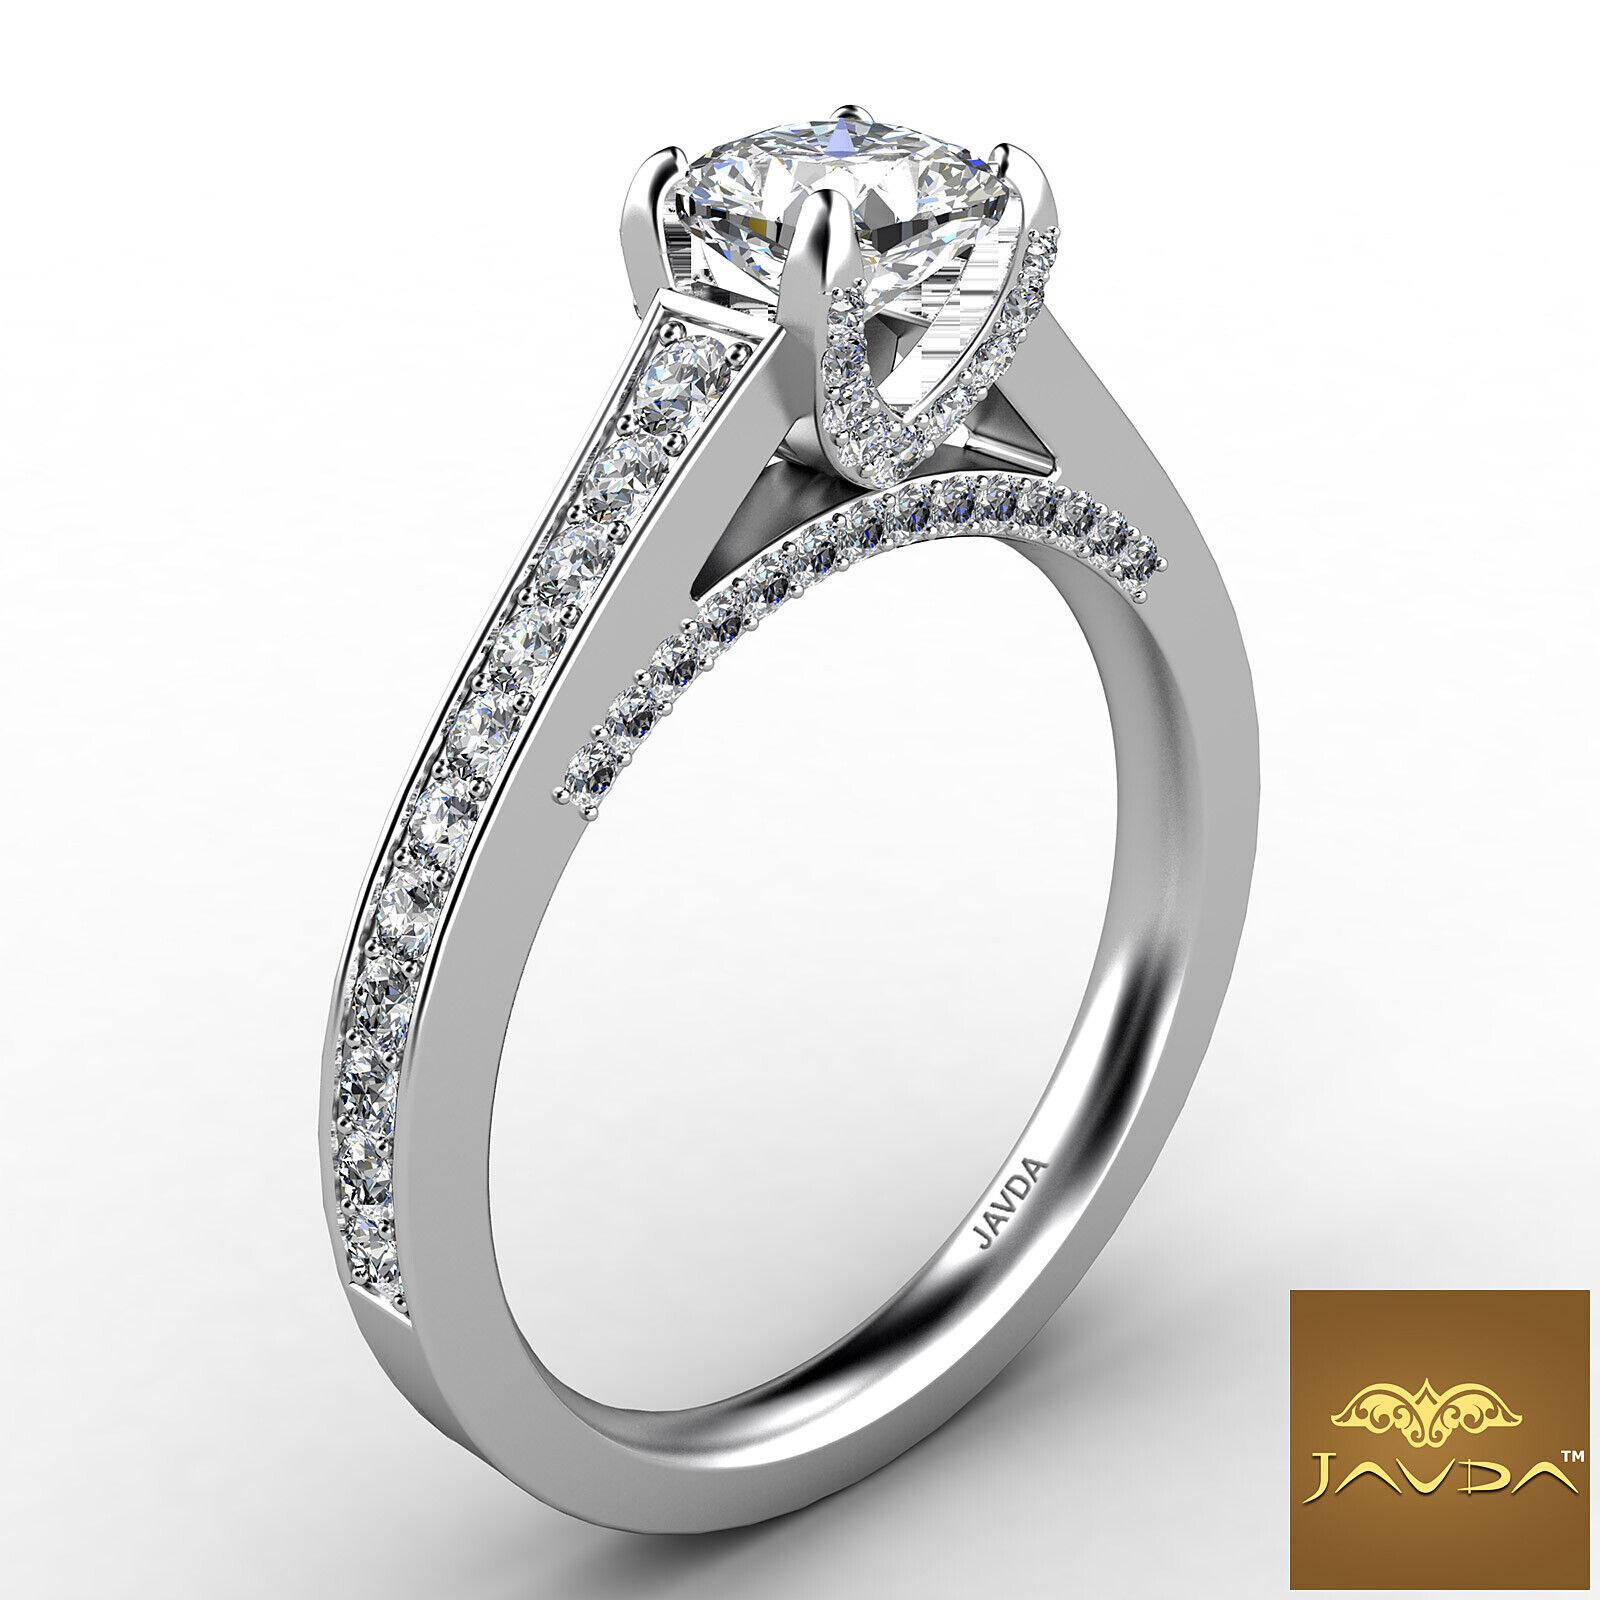 Cushion Cut Diamond Flawless Engagement GIA G VVS2 Pave Set Ring Platinum 1.25Ct 2